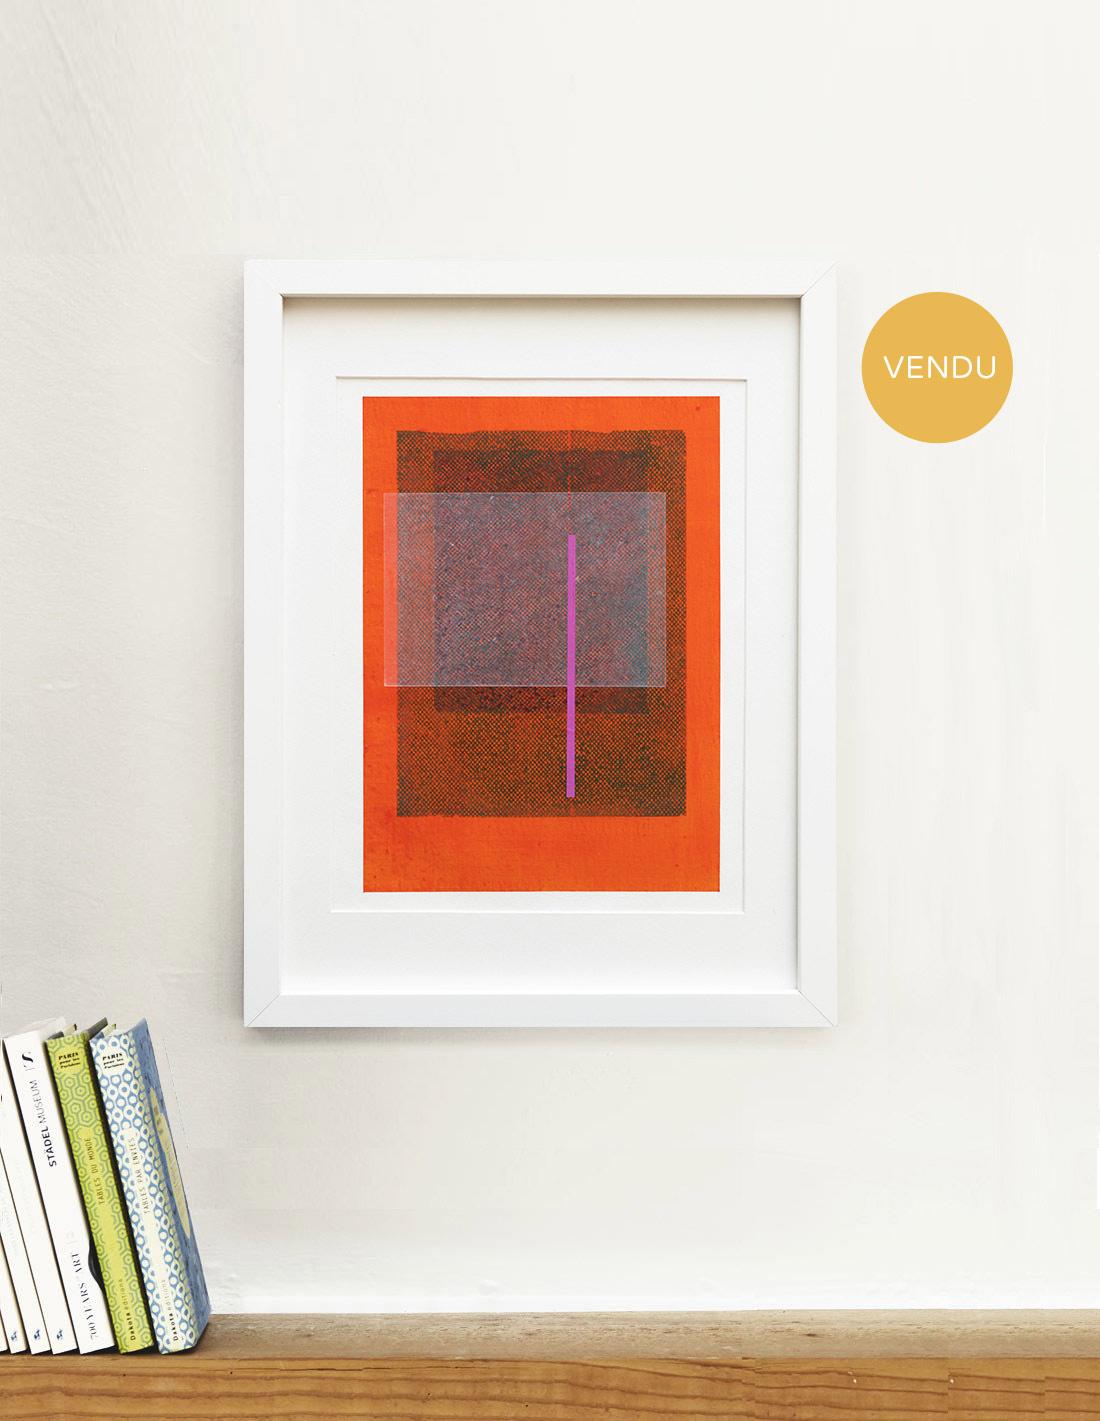 Sans-titre-orange-barre-violette-I-vendu